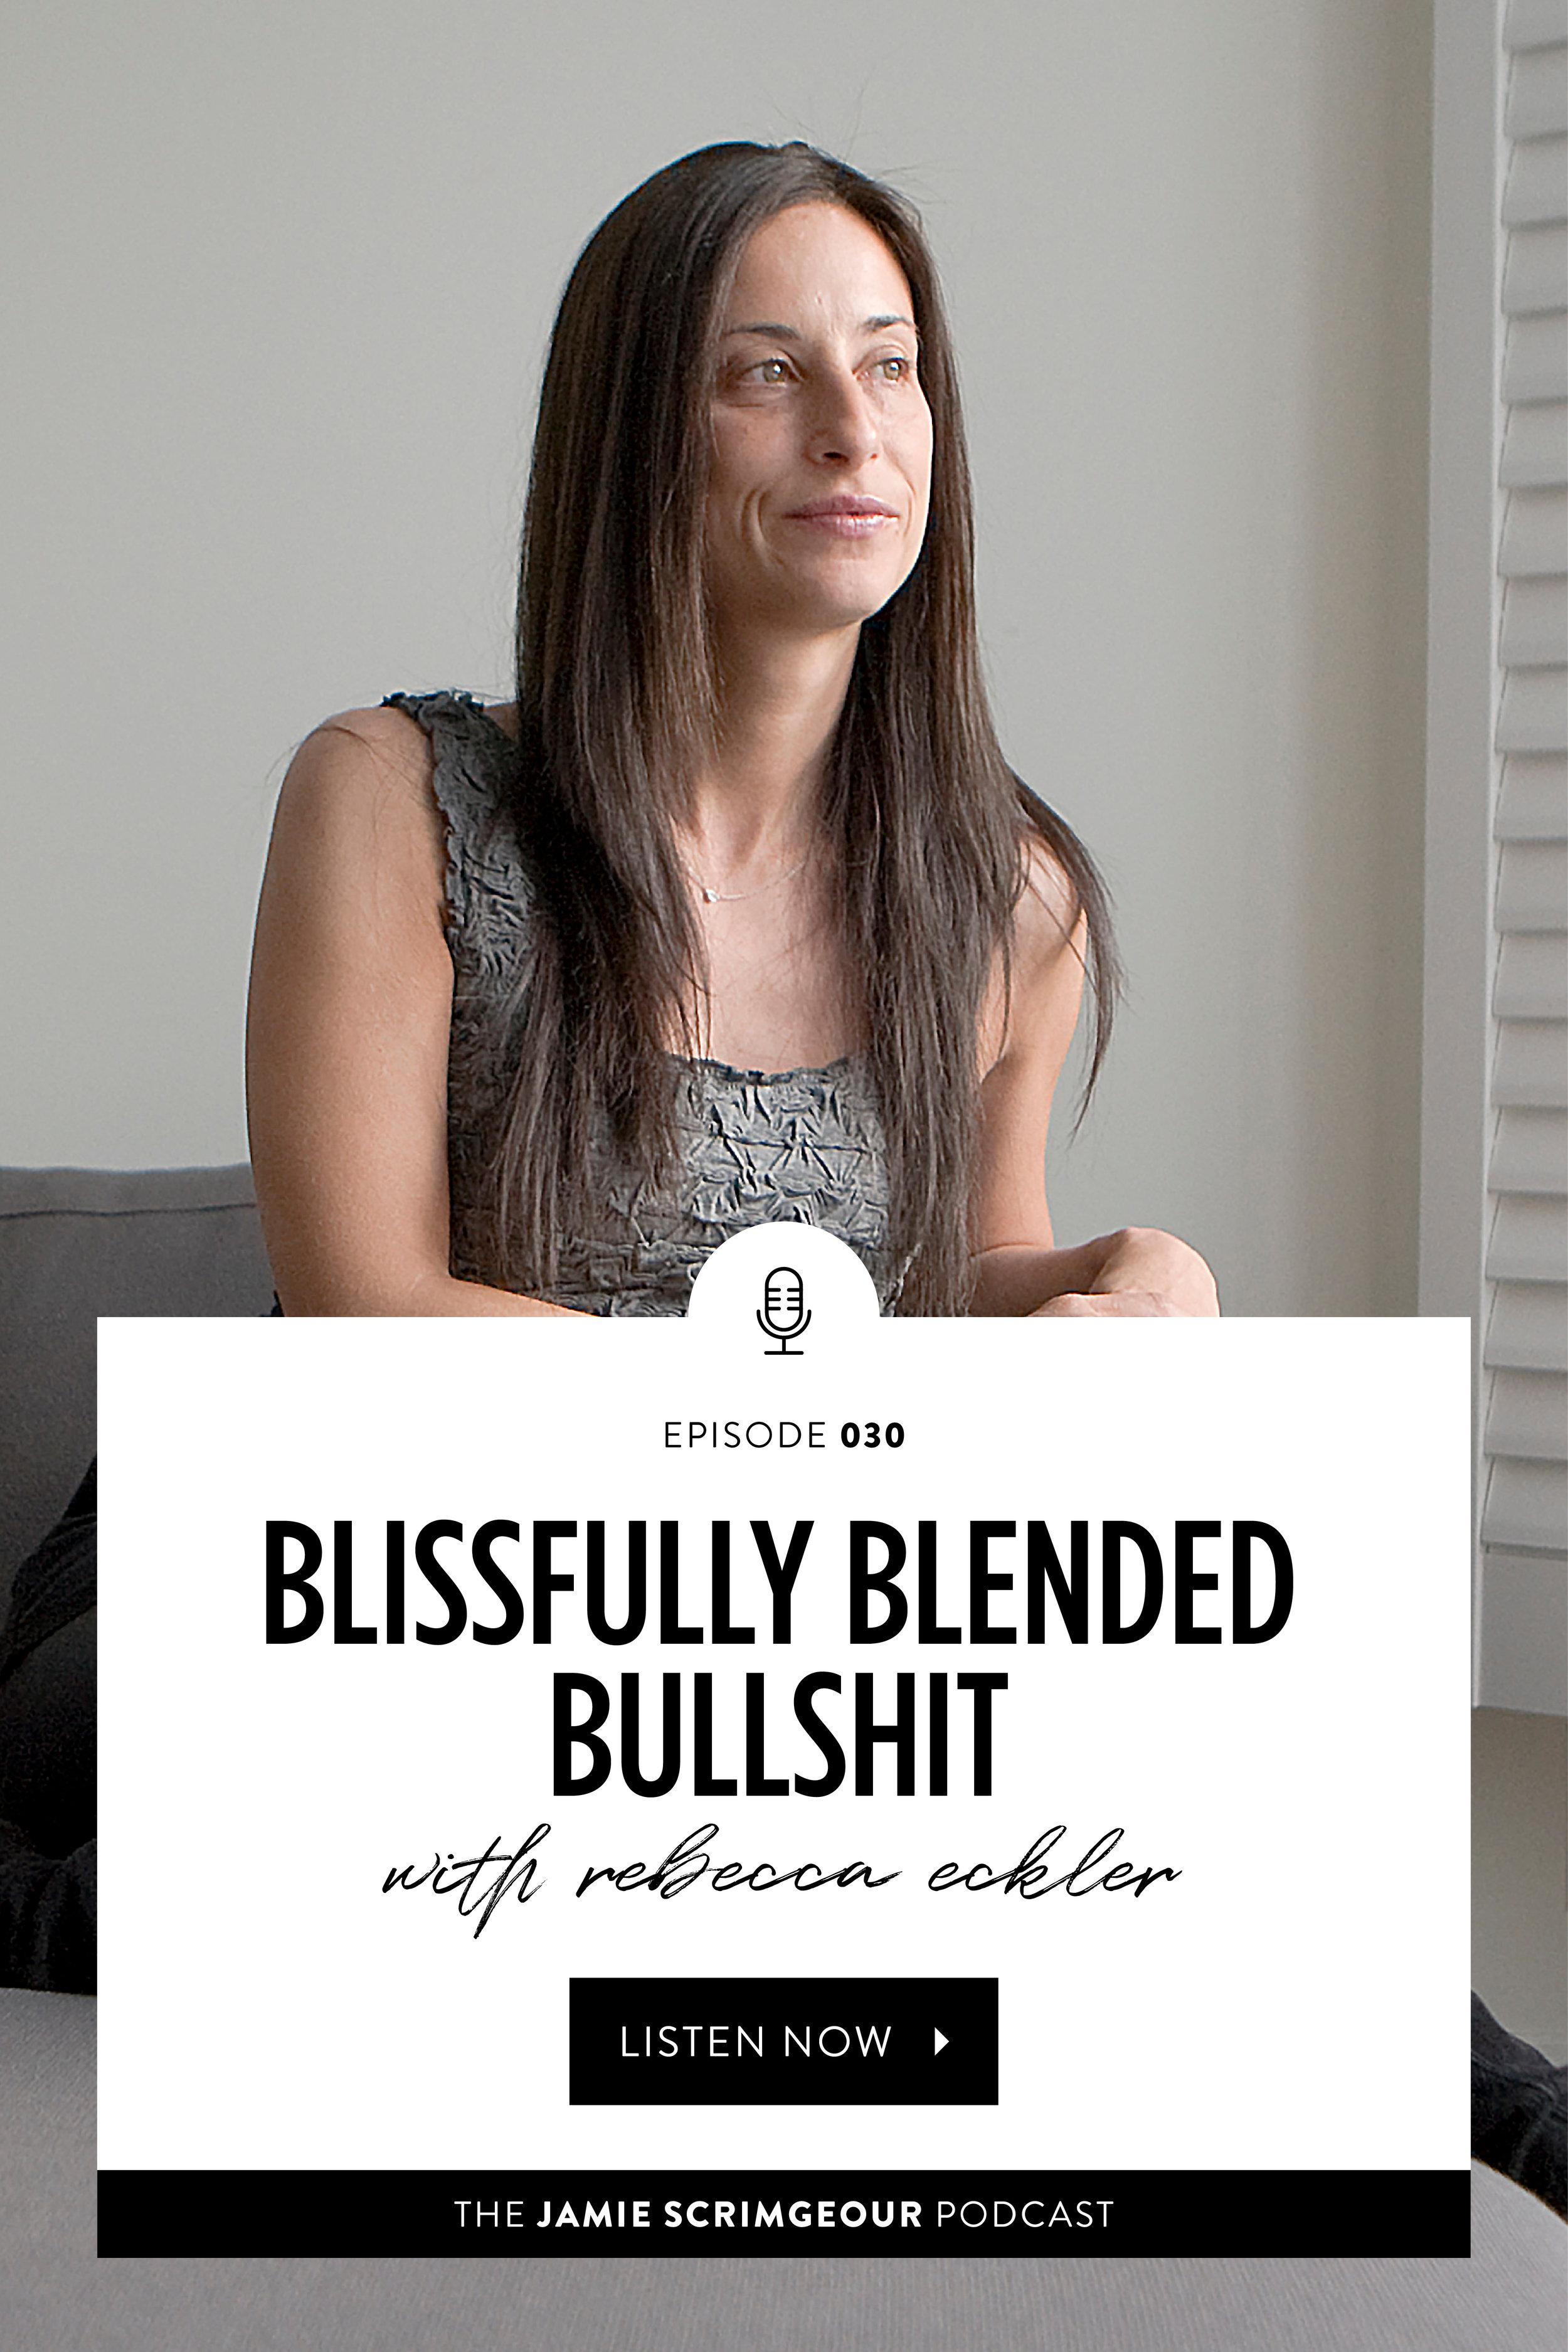 JS_Podcast_RebeccaEckler_Pinterest-d.jpg